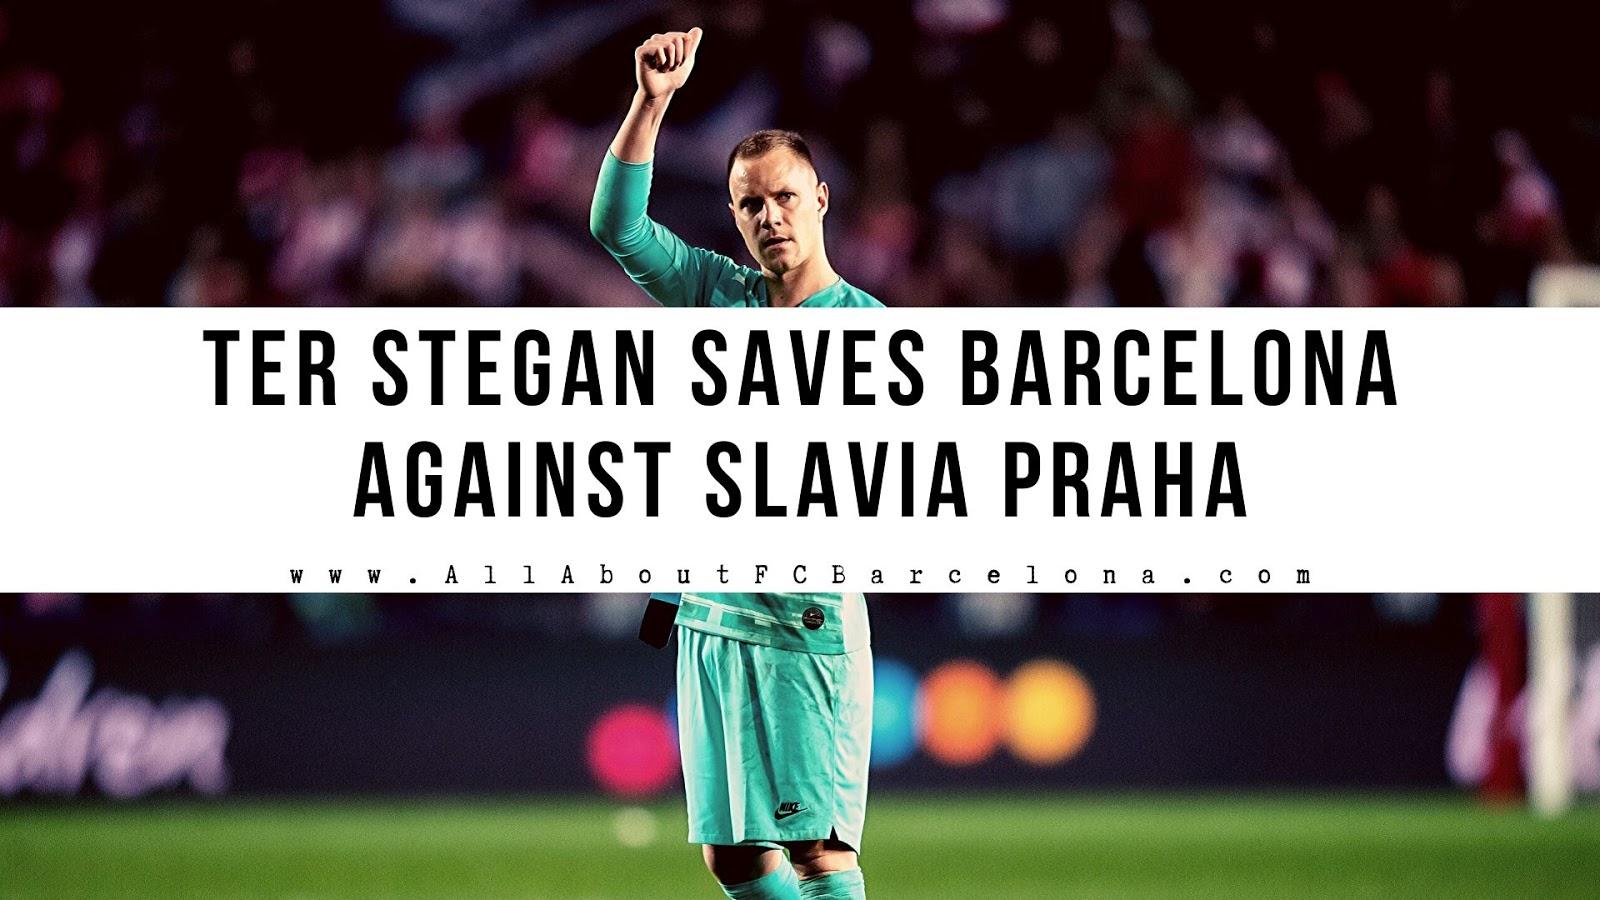 Ter Stegan's Heroics give Barcelona a Lucky Victory against Slavia Praha